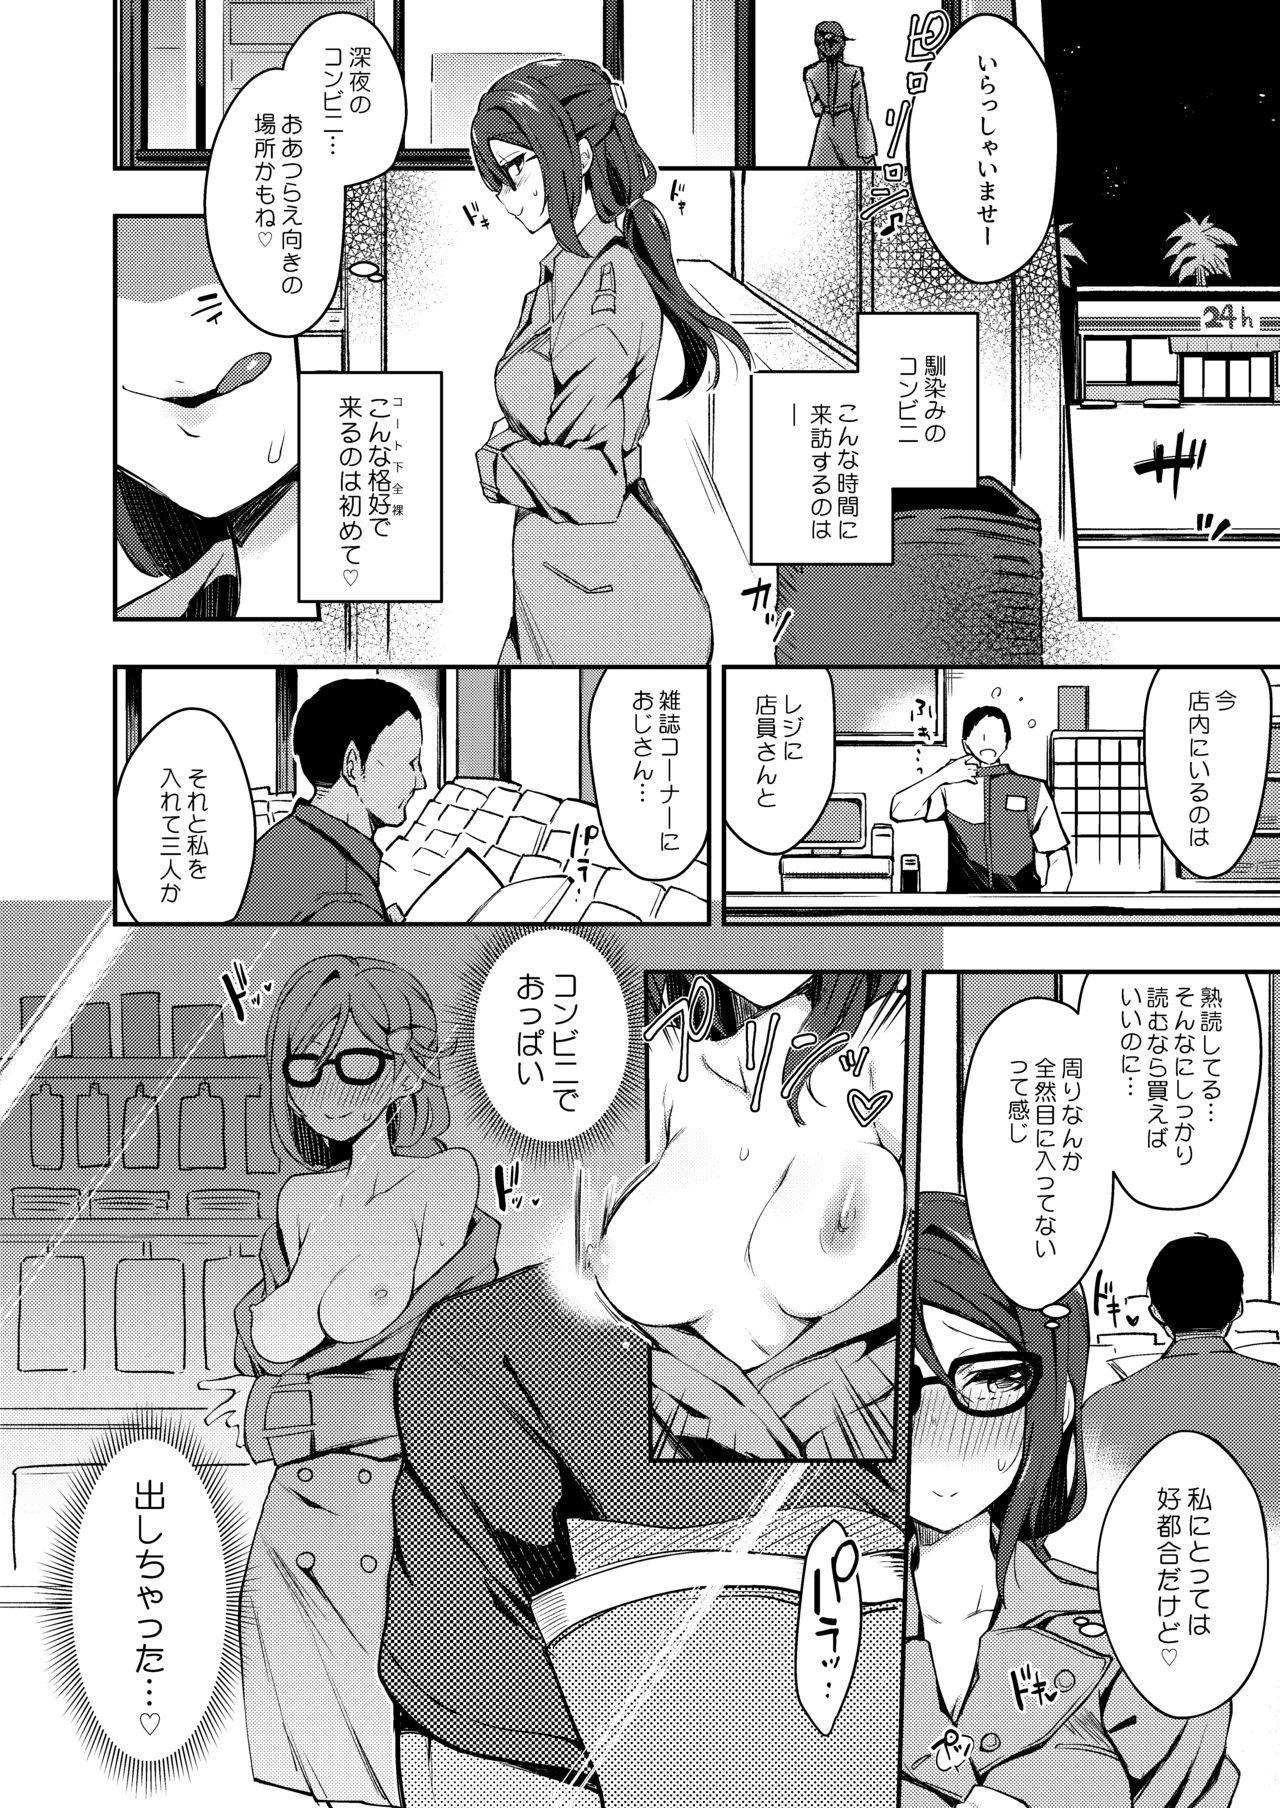 Ecchi Sketch Ro Ona Uchi. Soushuuhen 18